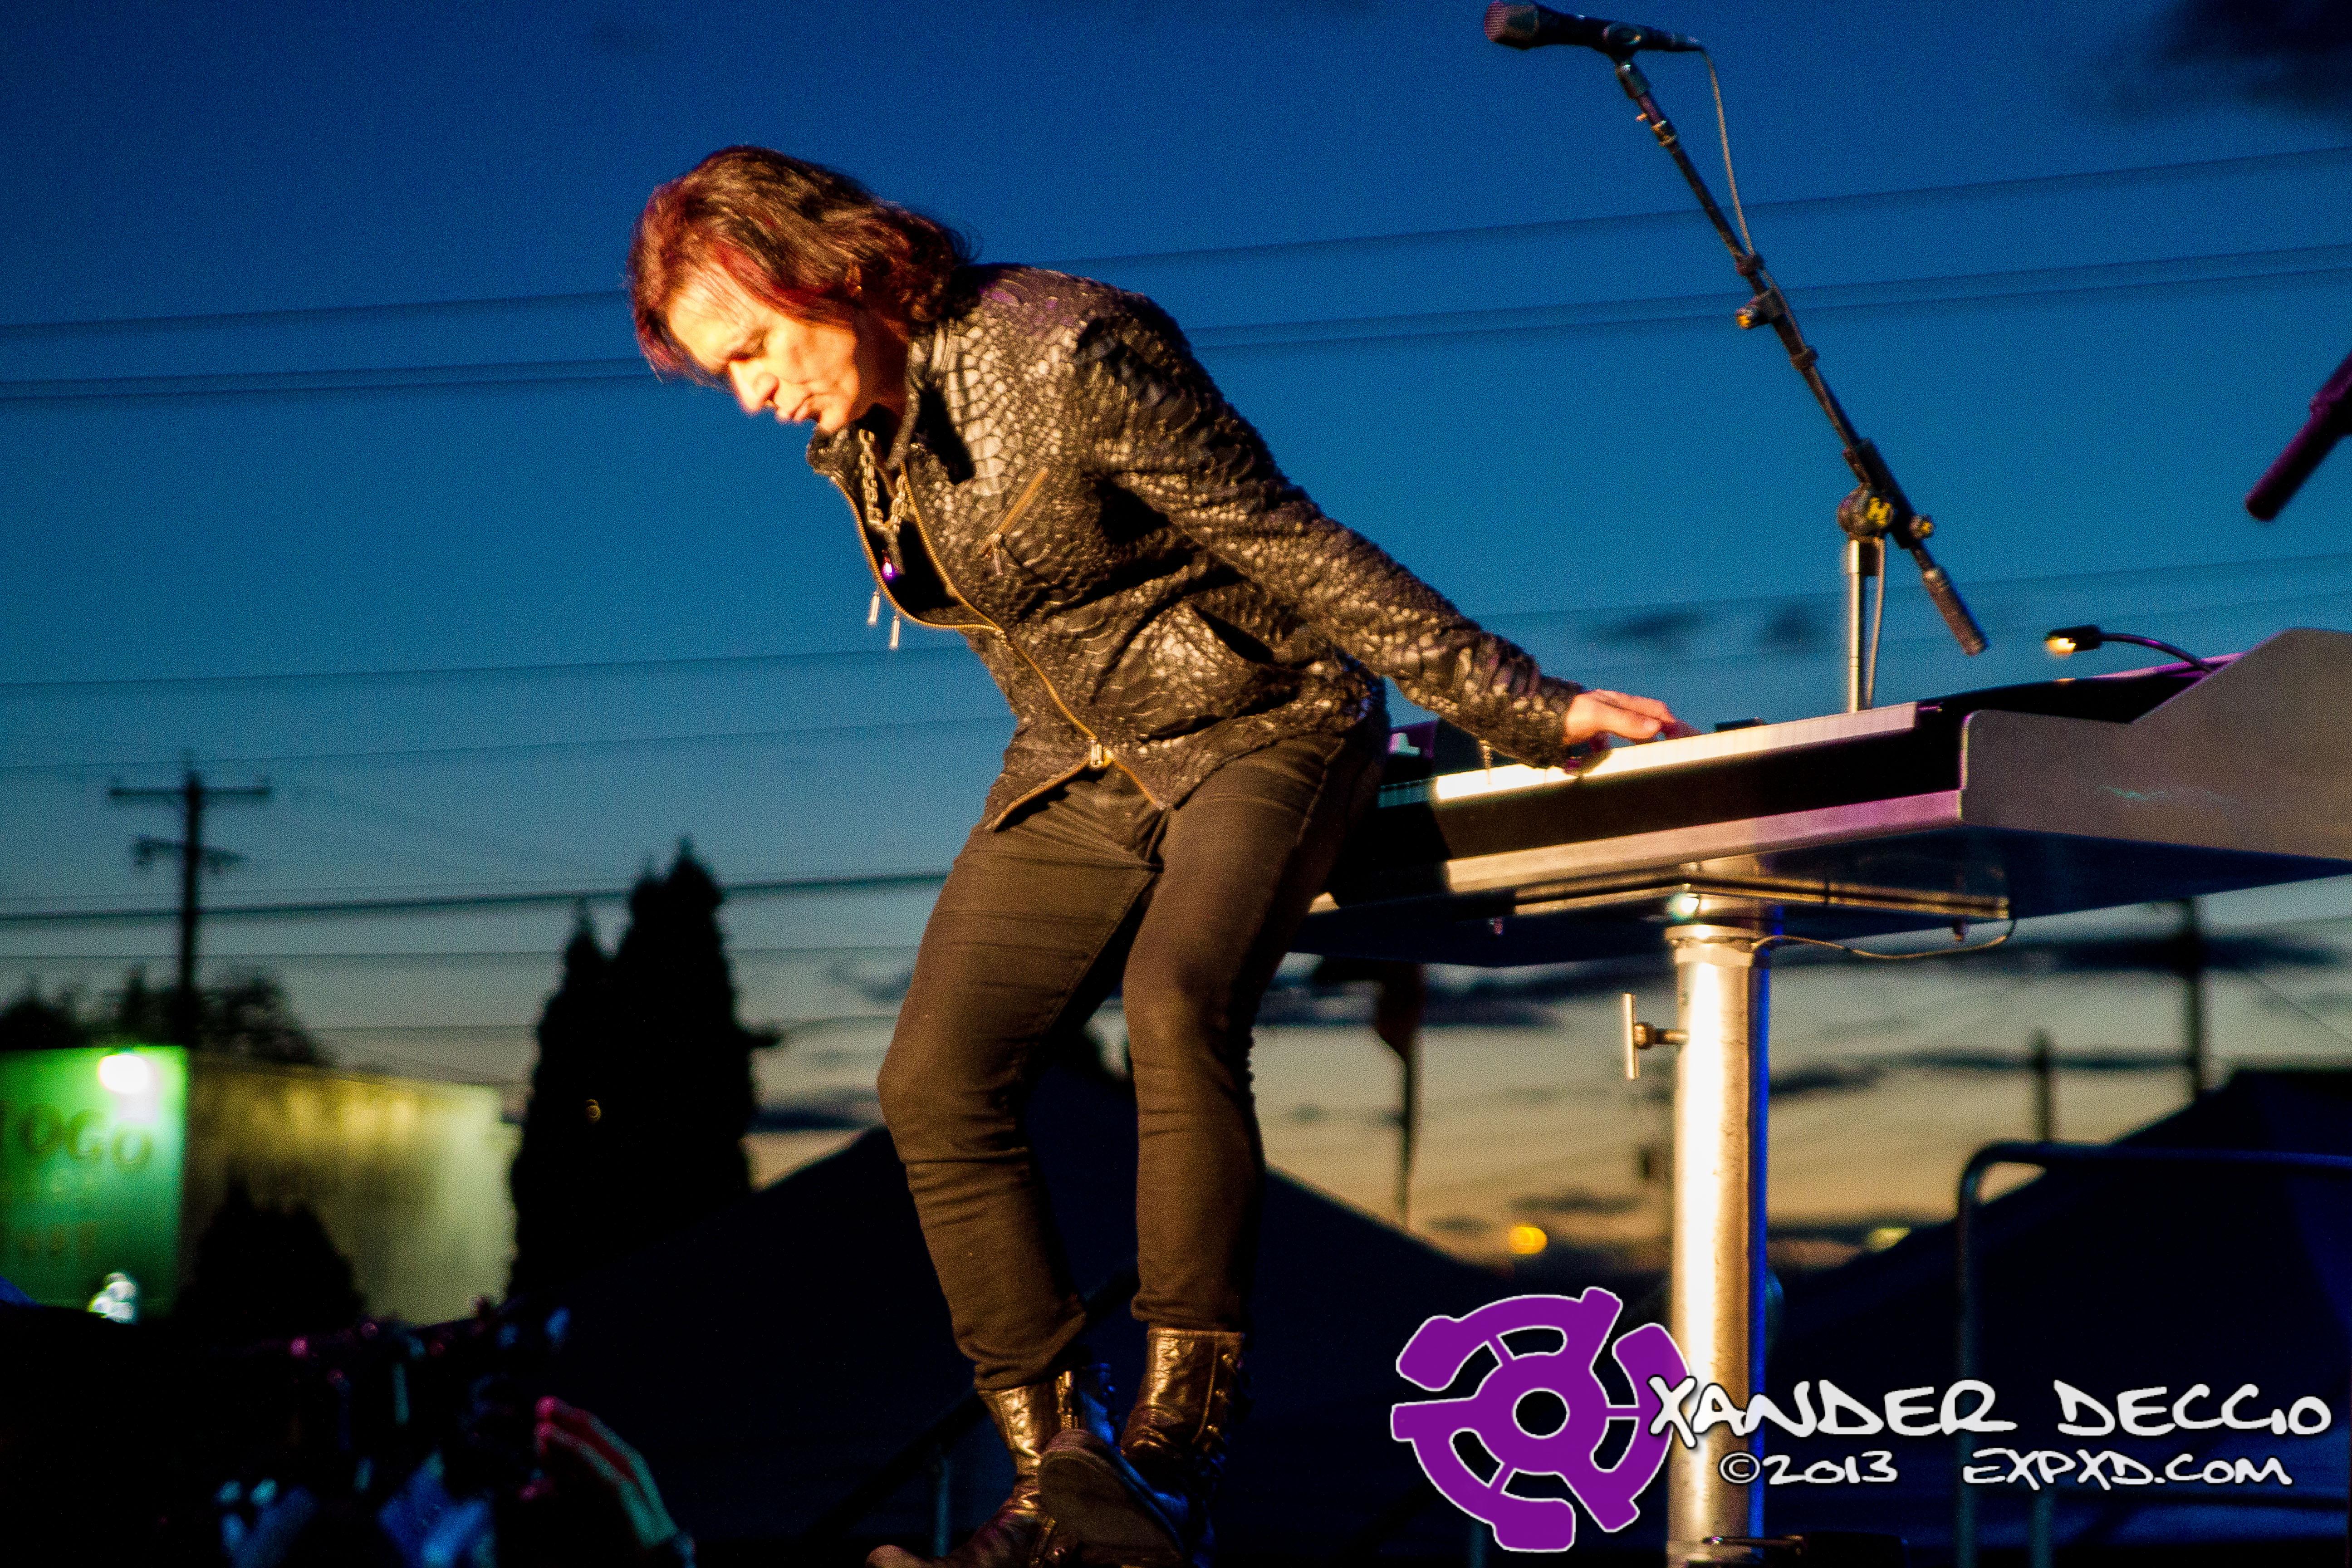 Styx @ Central Washington State Fair (Photo By Xander Deccio)